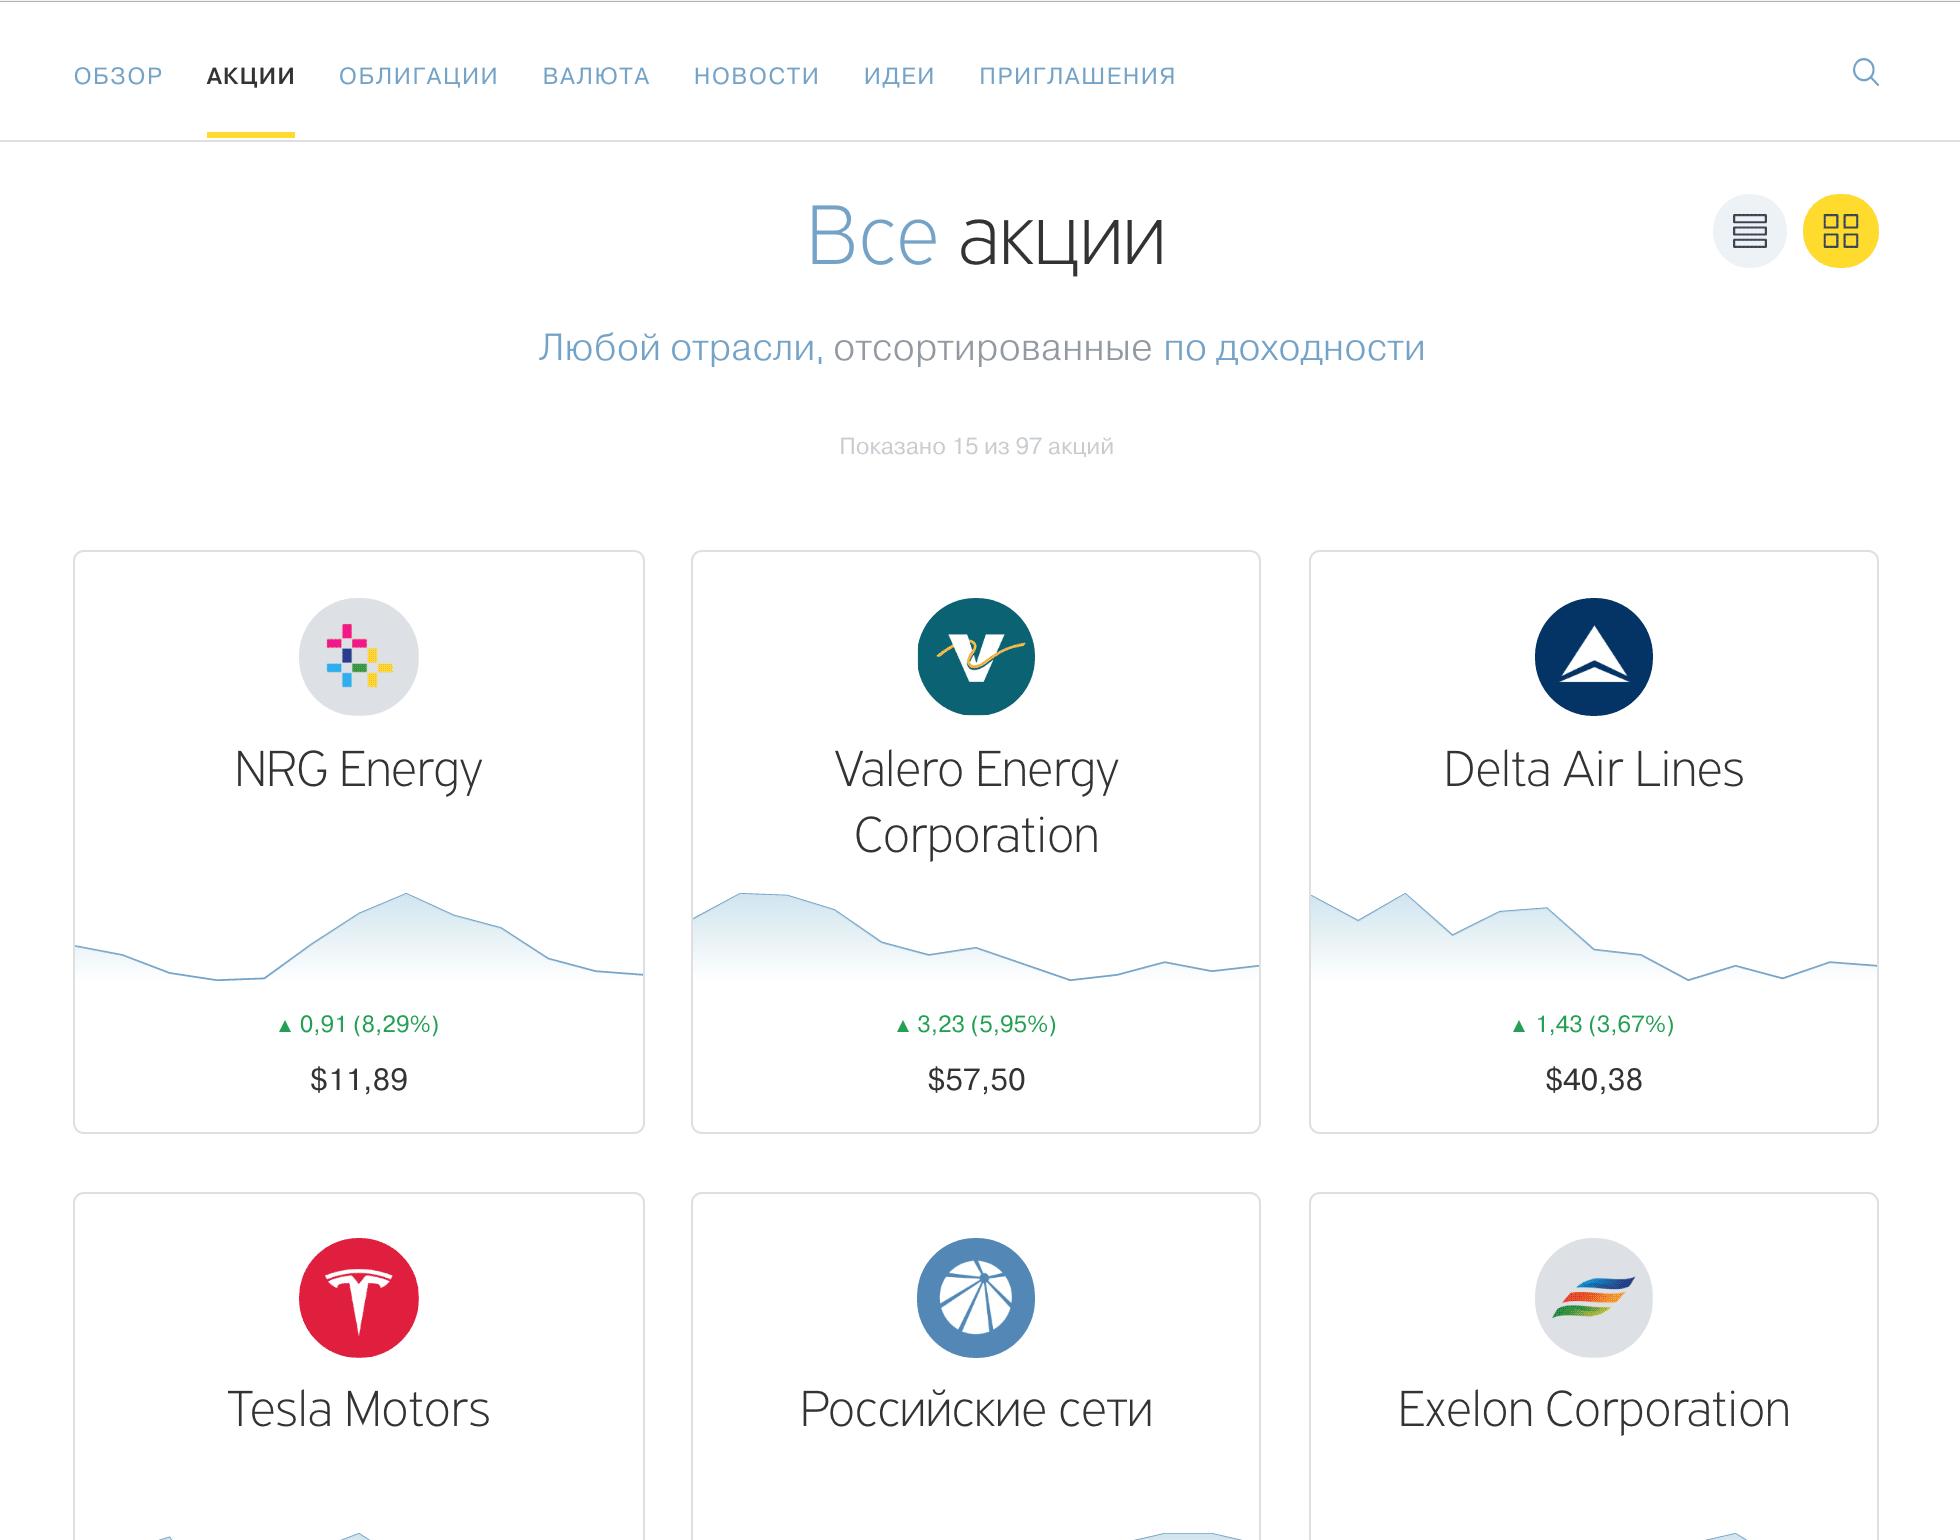 втб кредит онлайн калькулятор кредита